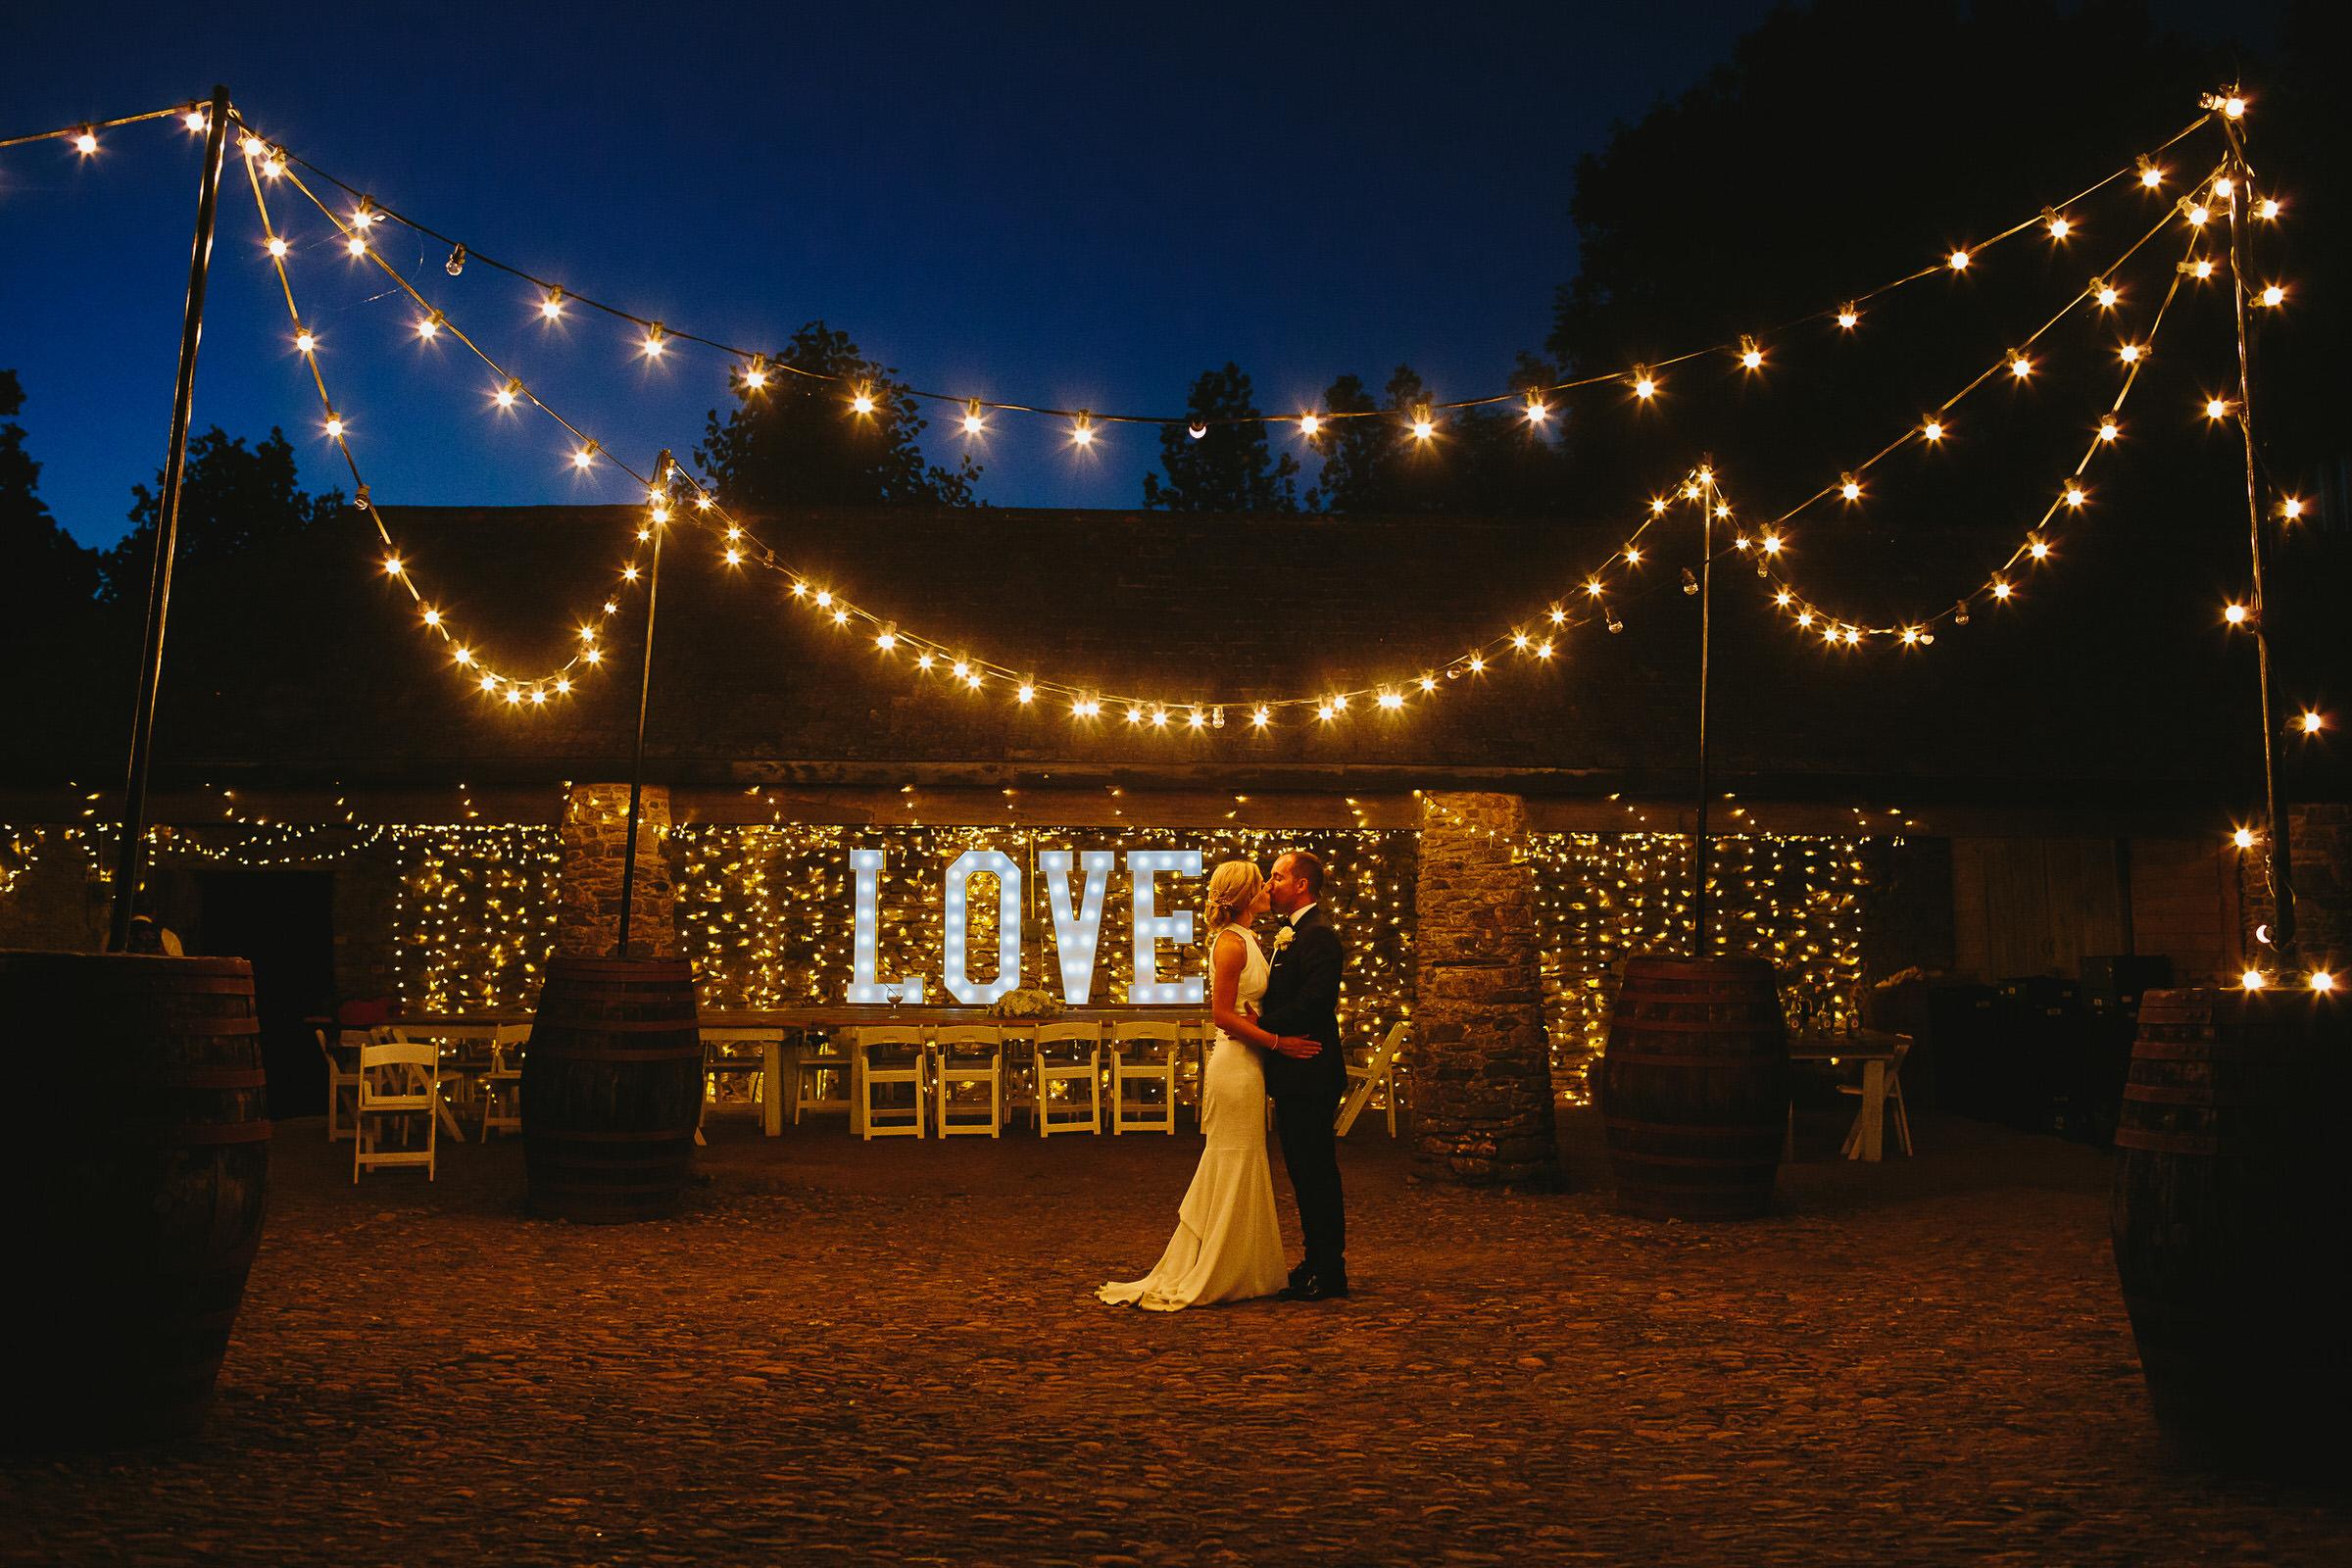 festoon lights wedding